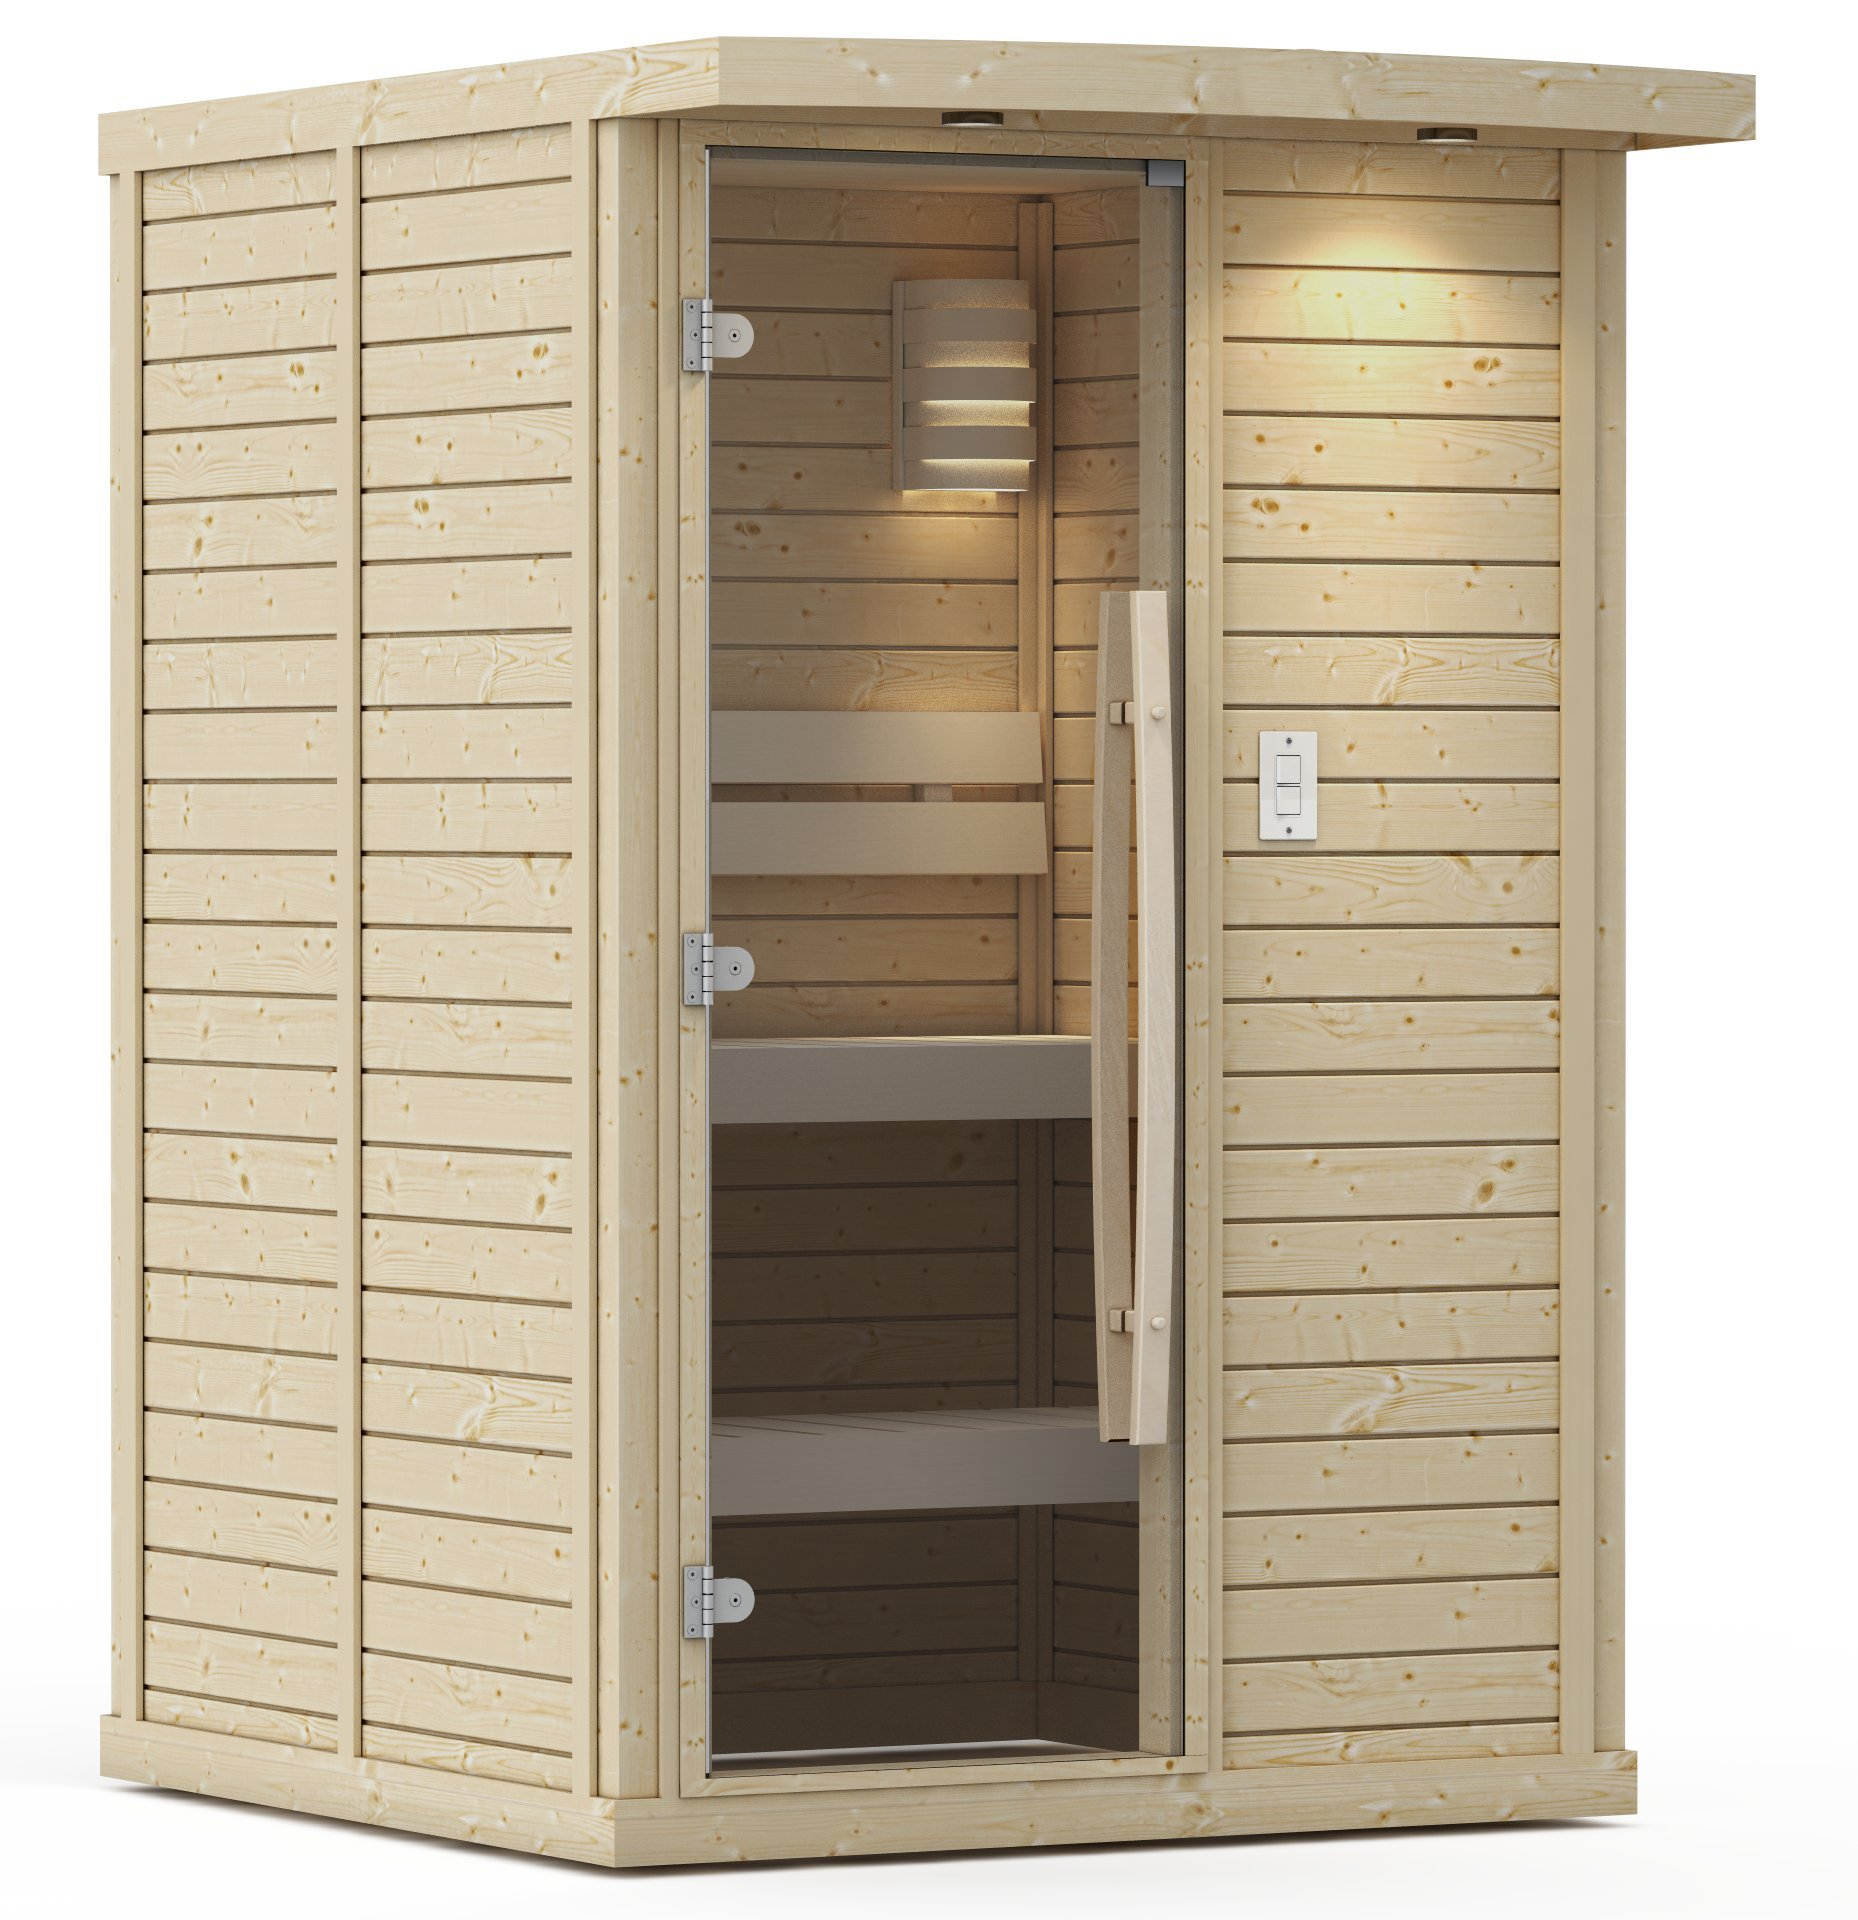 Goldstar 1000-A Prebuilt Traditional Sauna w/ Canopy & Lights by Goldstar